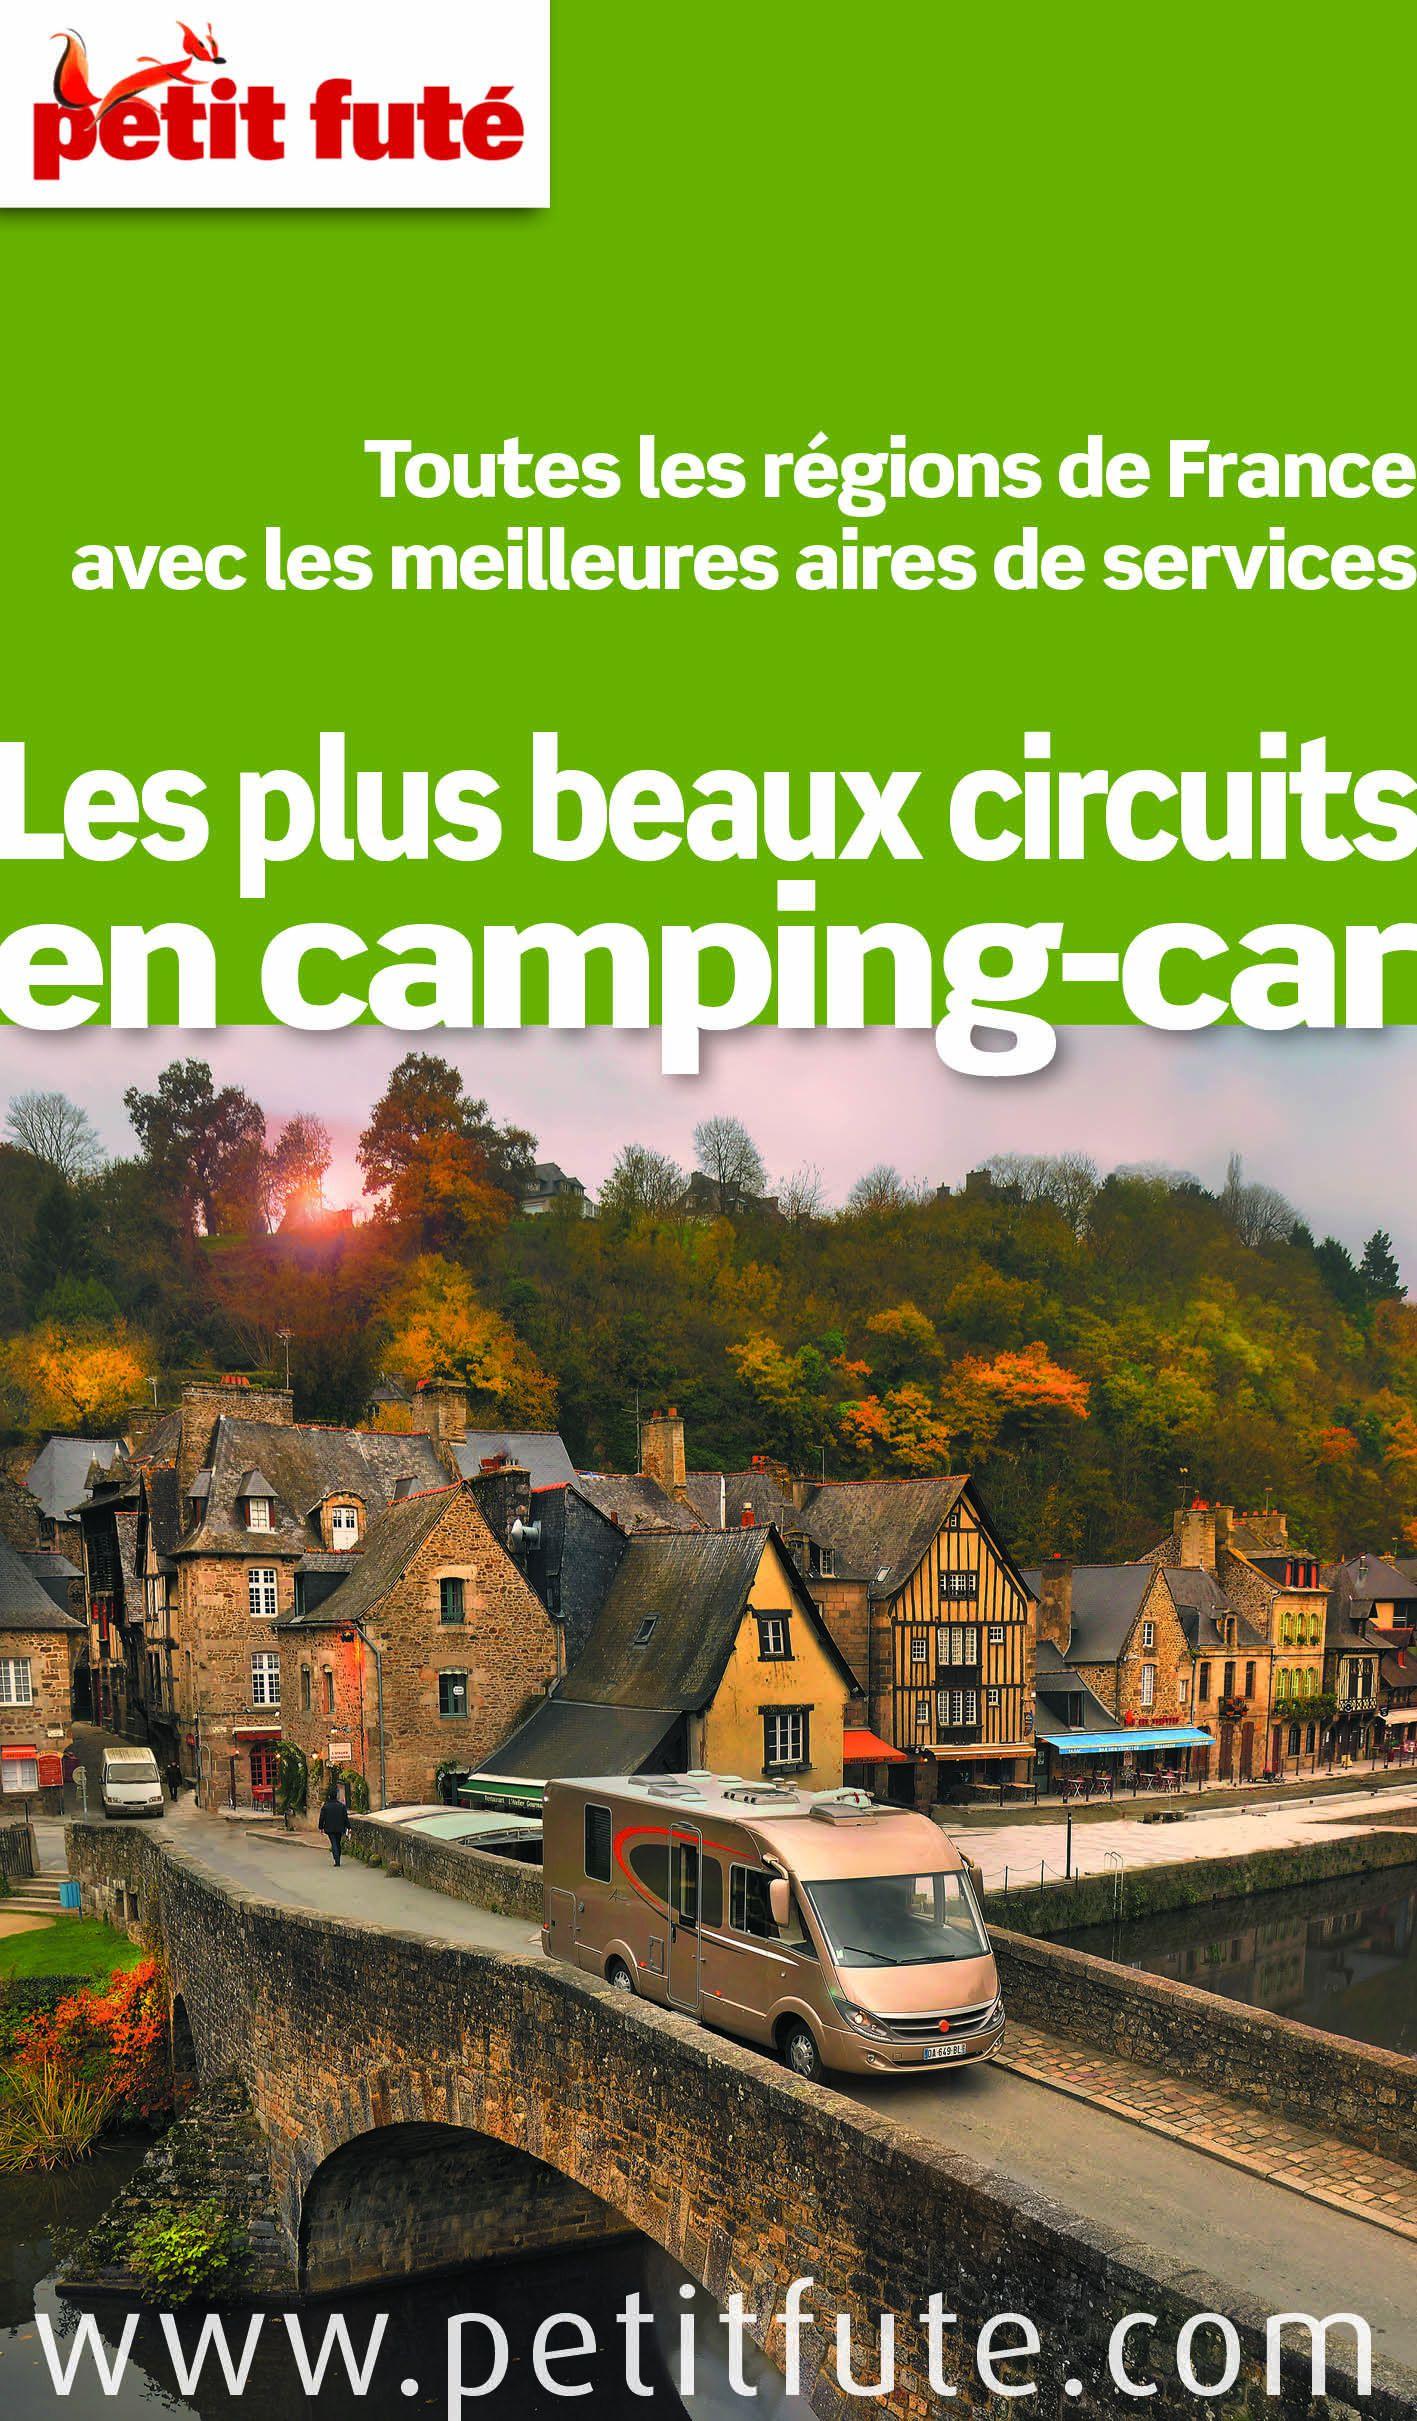 Plus Beaux Circuits Camping Car : beaux, circuits, camping, Beaux, Circuits, Camping-car,, édition, 2014